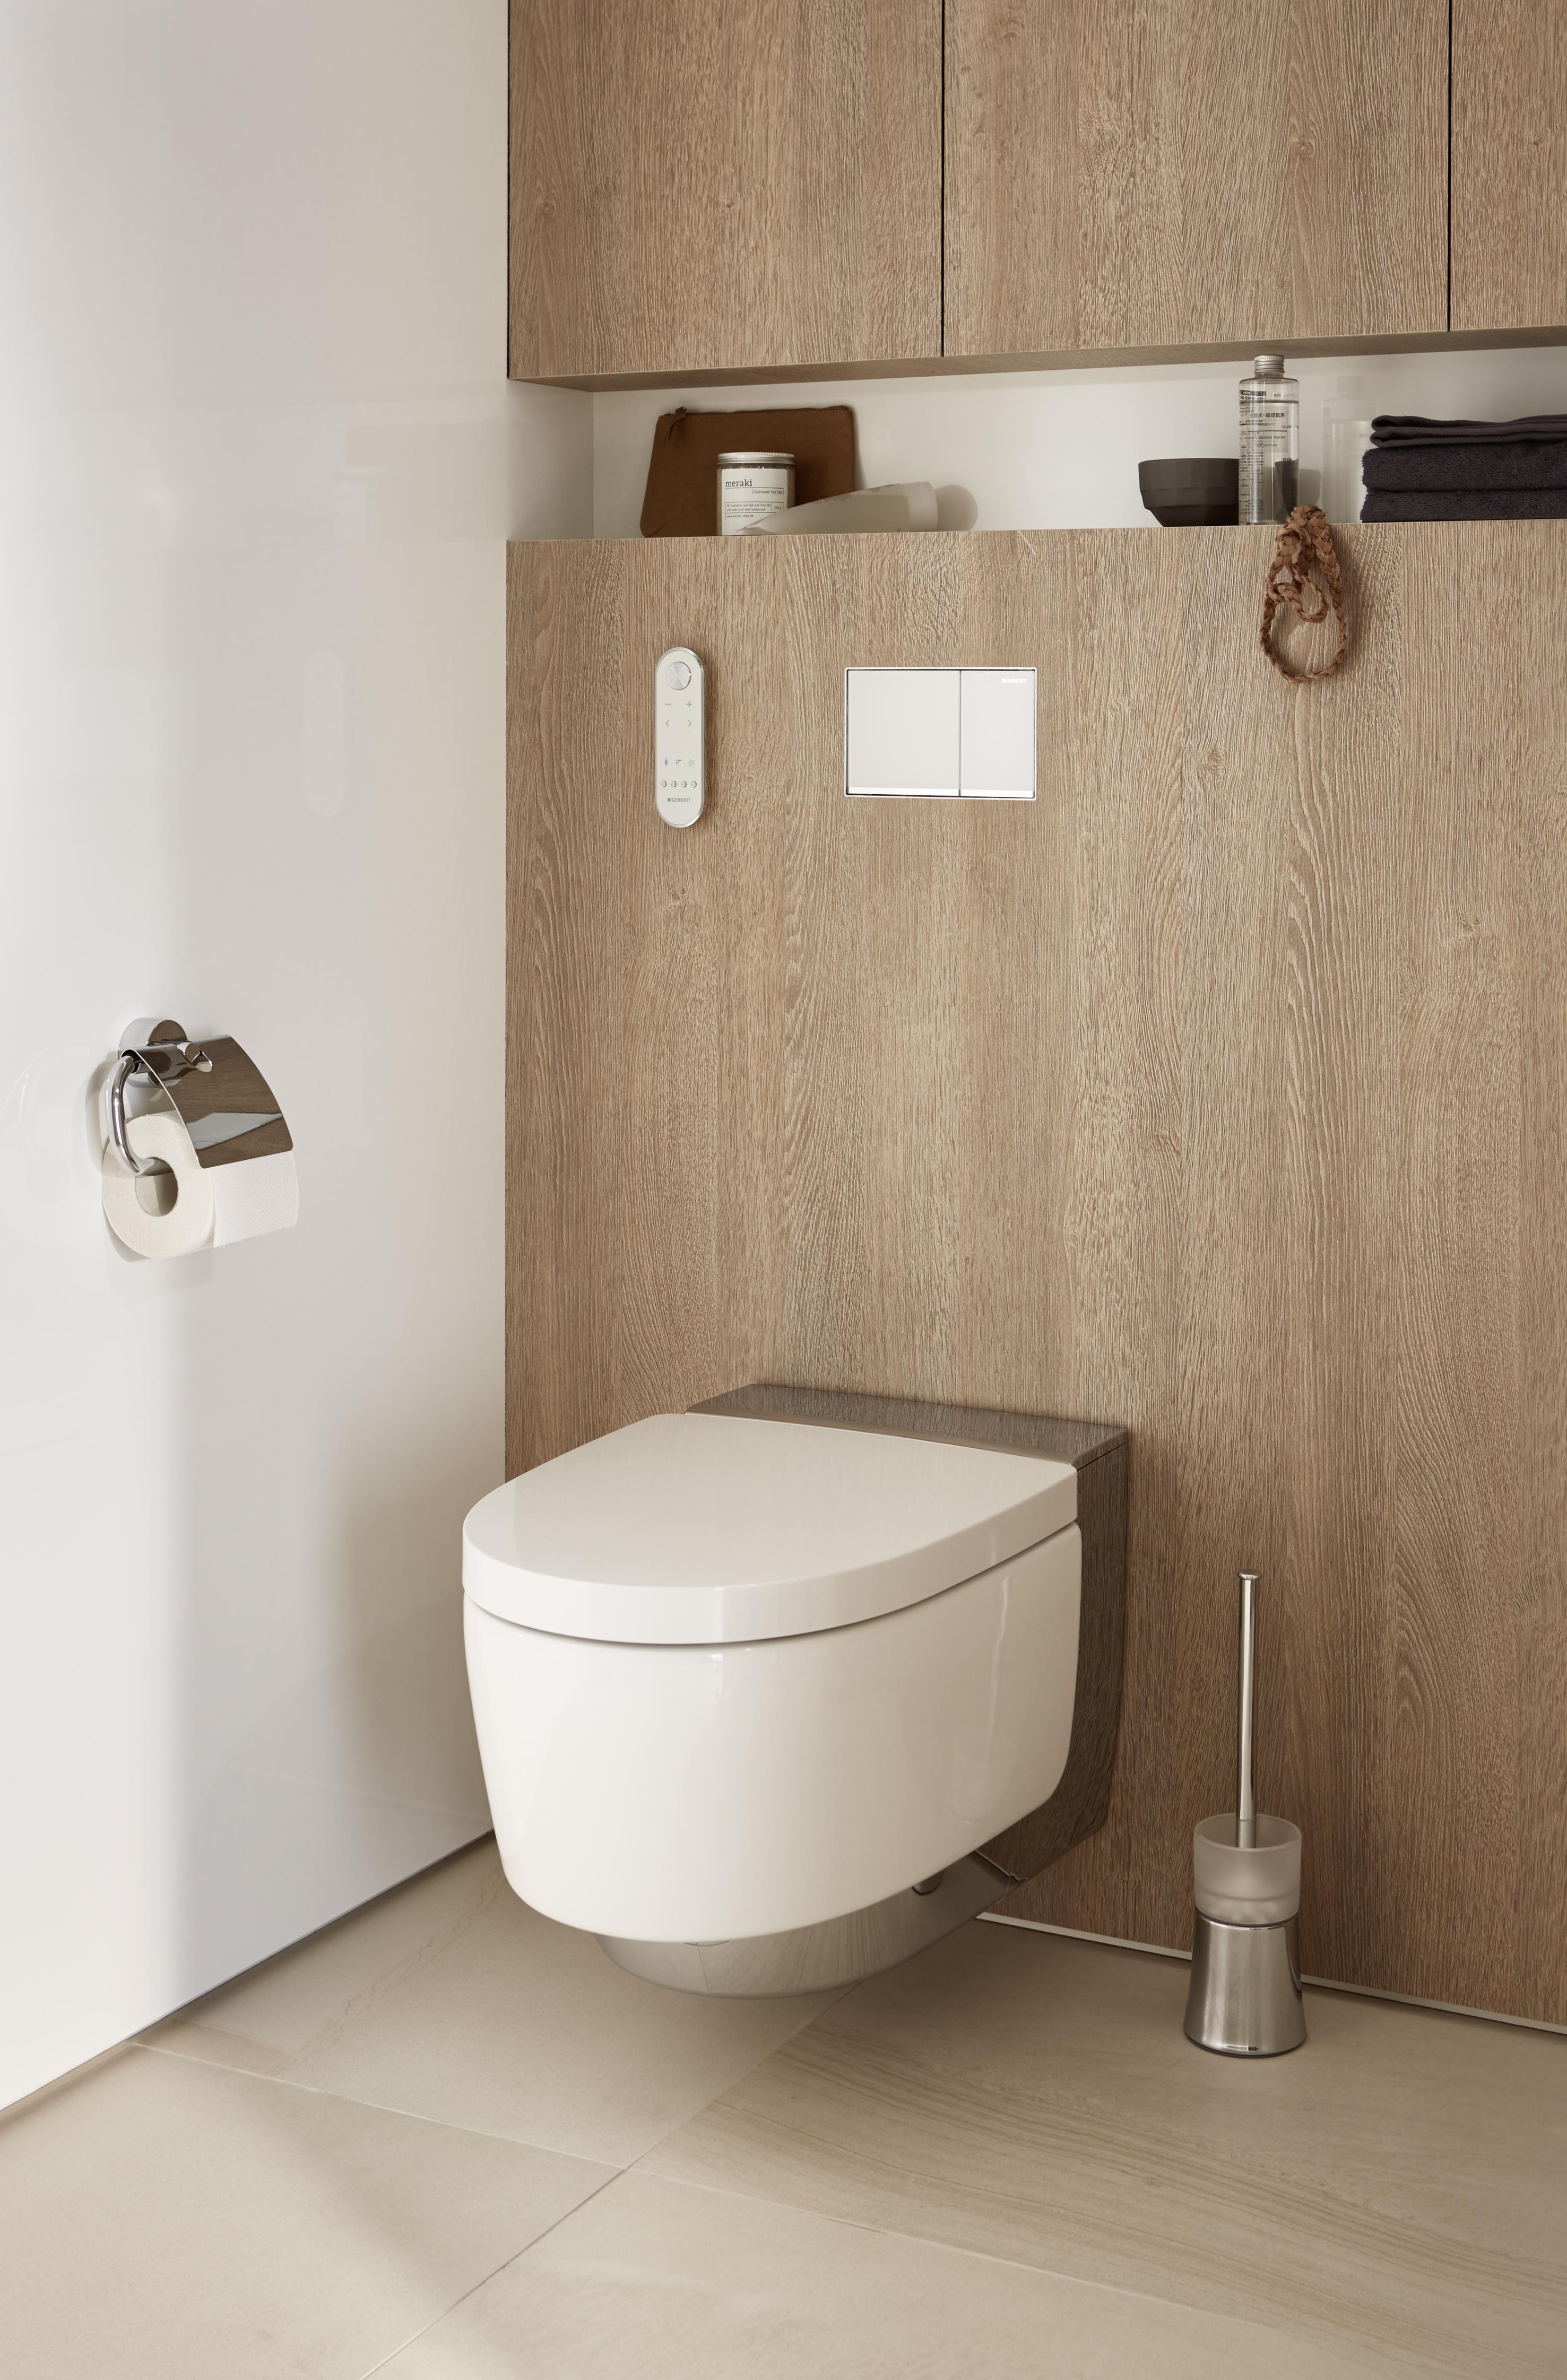 hurra ich bekomme ein dusch wc design dots. Black Bedroom Furniture Sets. Home Design Ideas